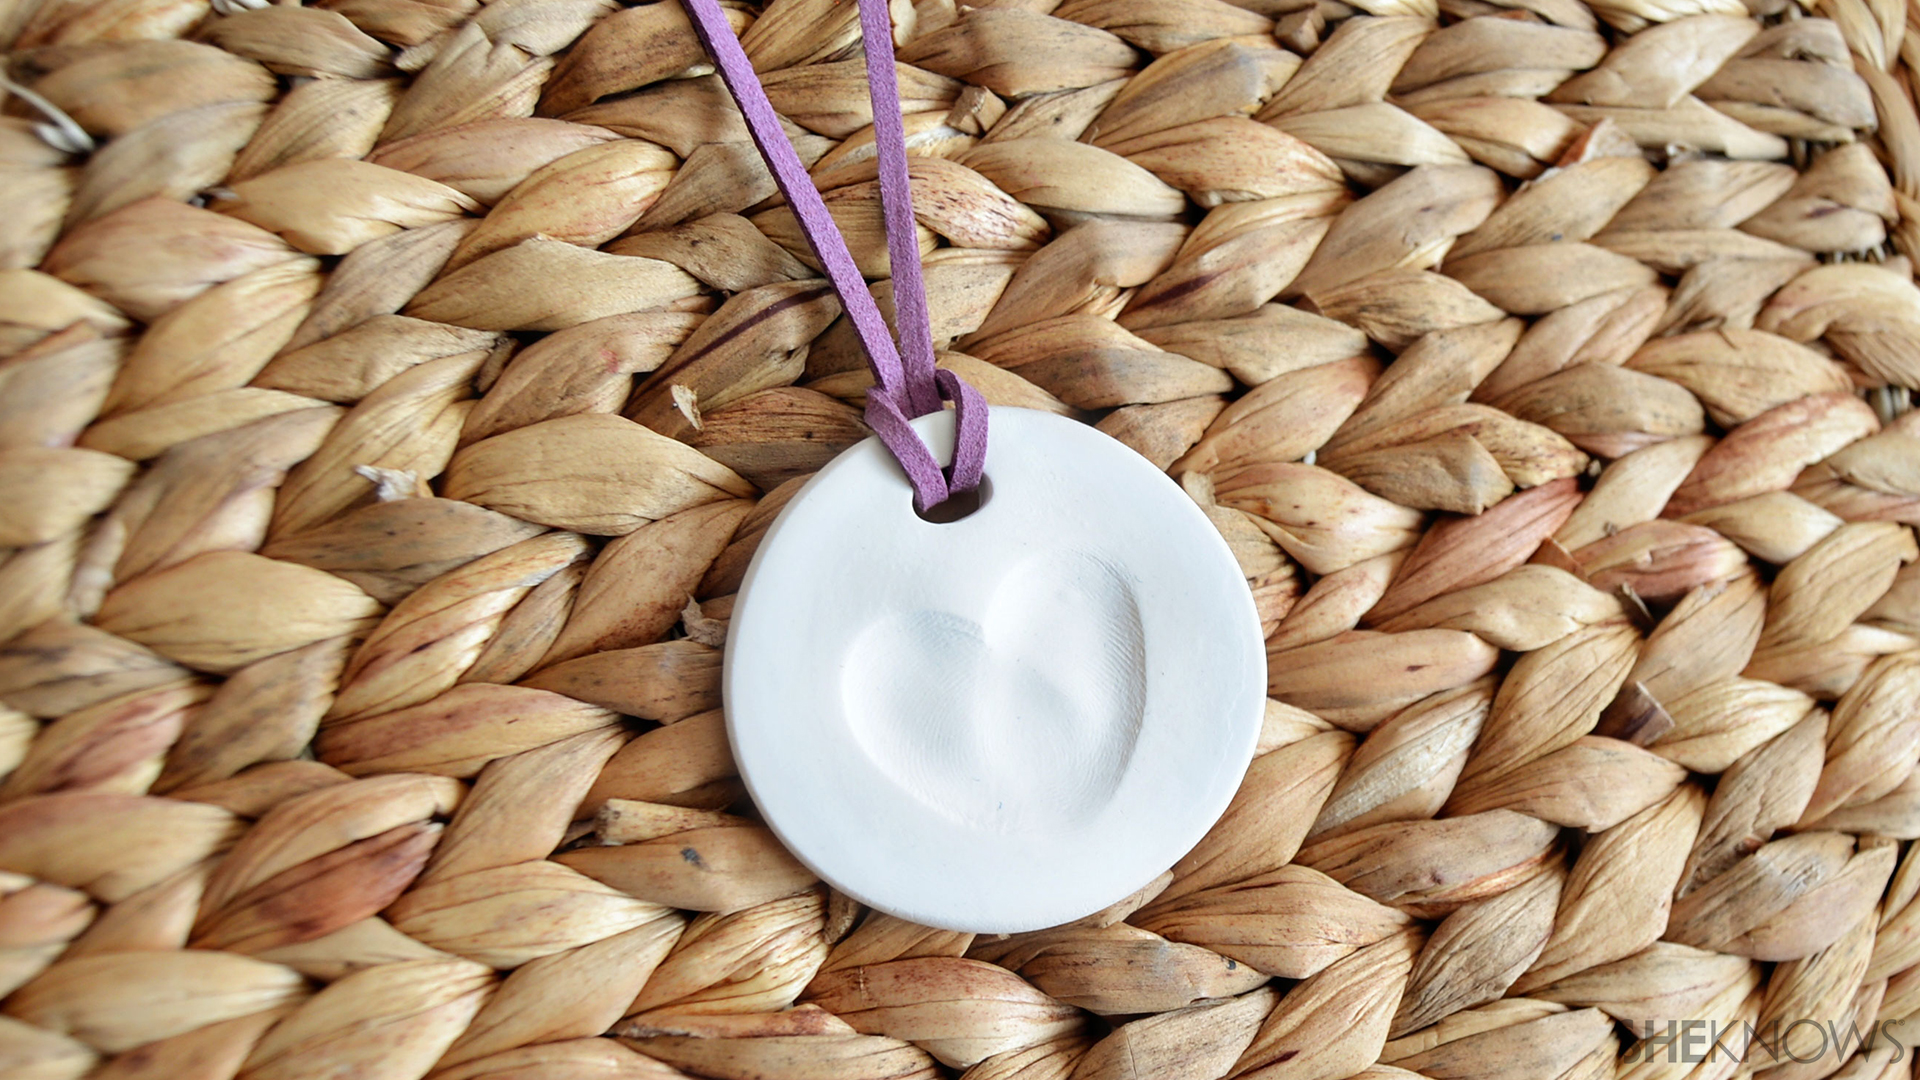 Heart thumb print necklace | Sheknows.com